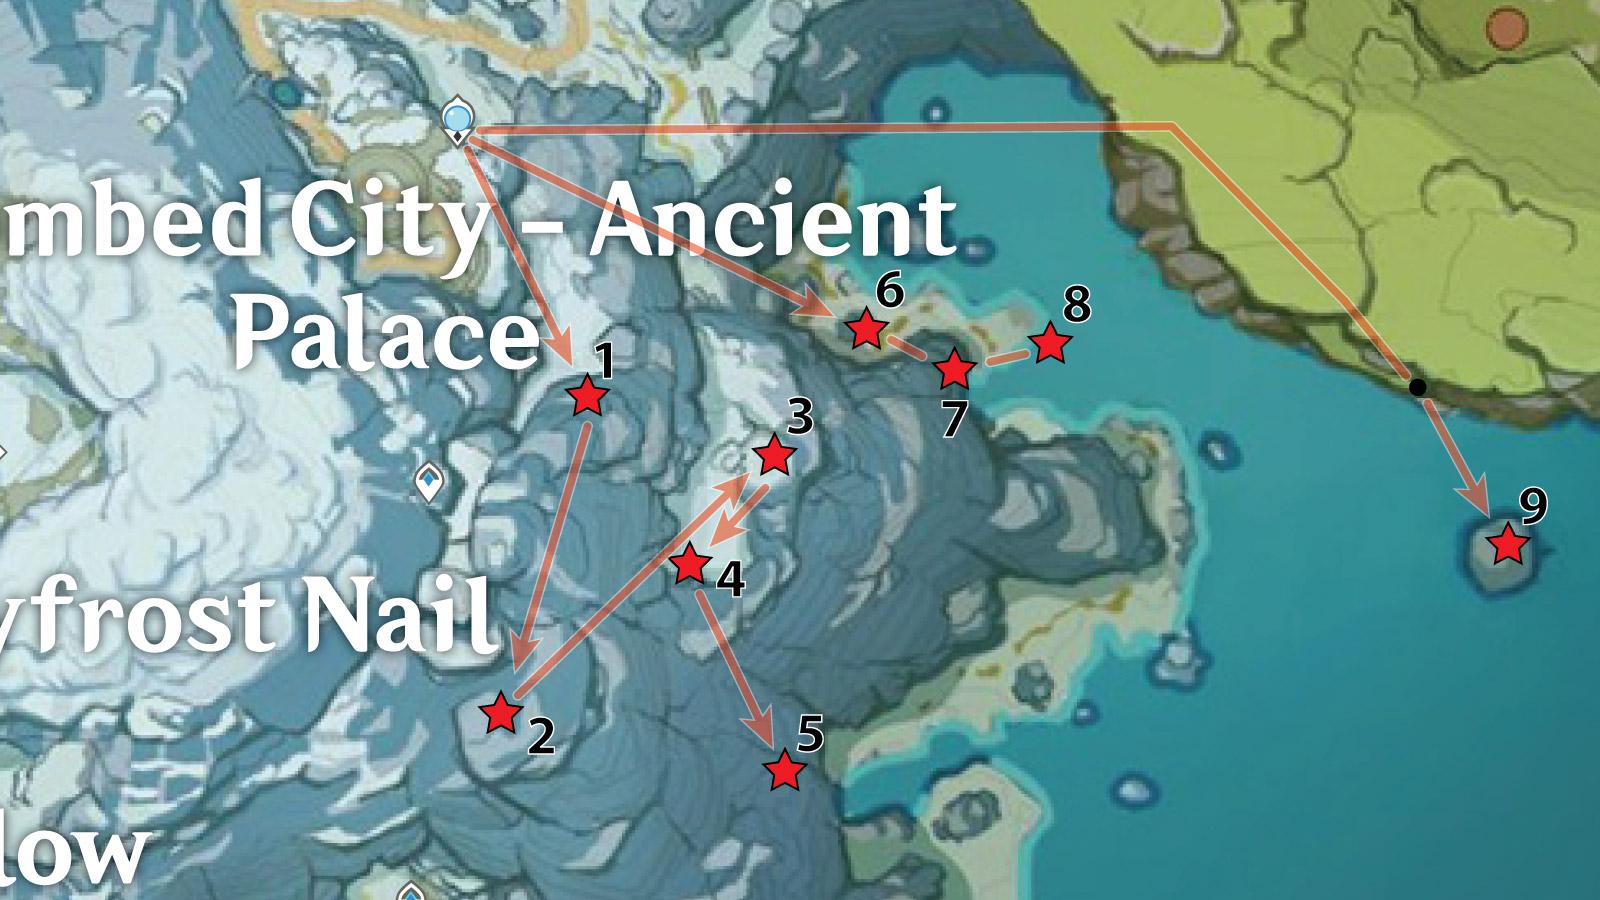 Ancient Palace - Southeast Crimson Agate Locations